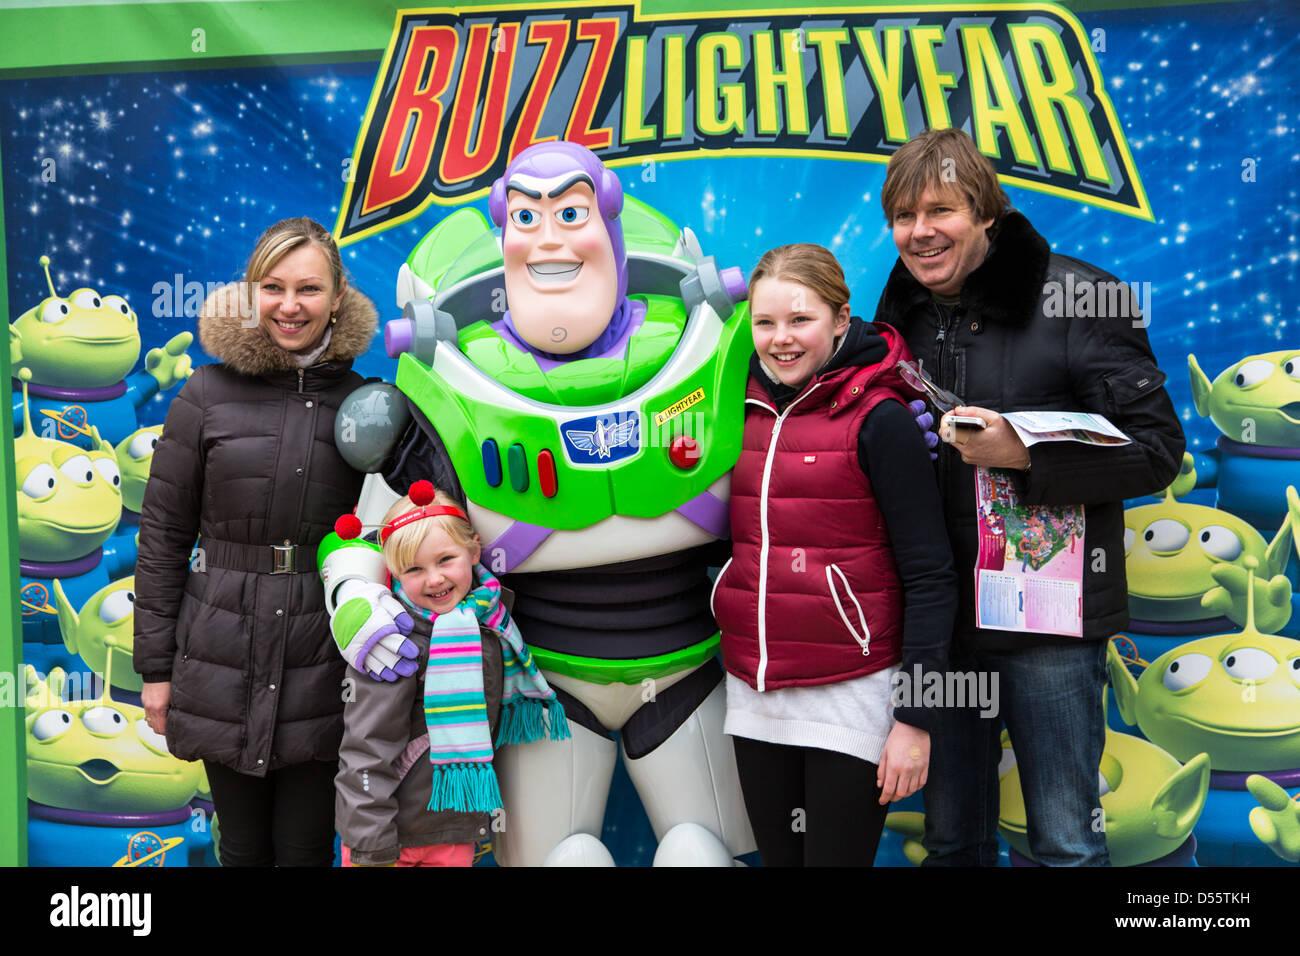 Buzz Lightyear Character Meet and Greet, Disneyland Paris - Stock Image